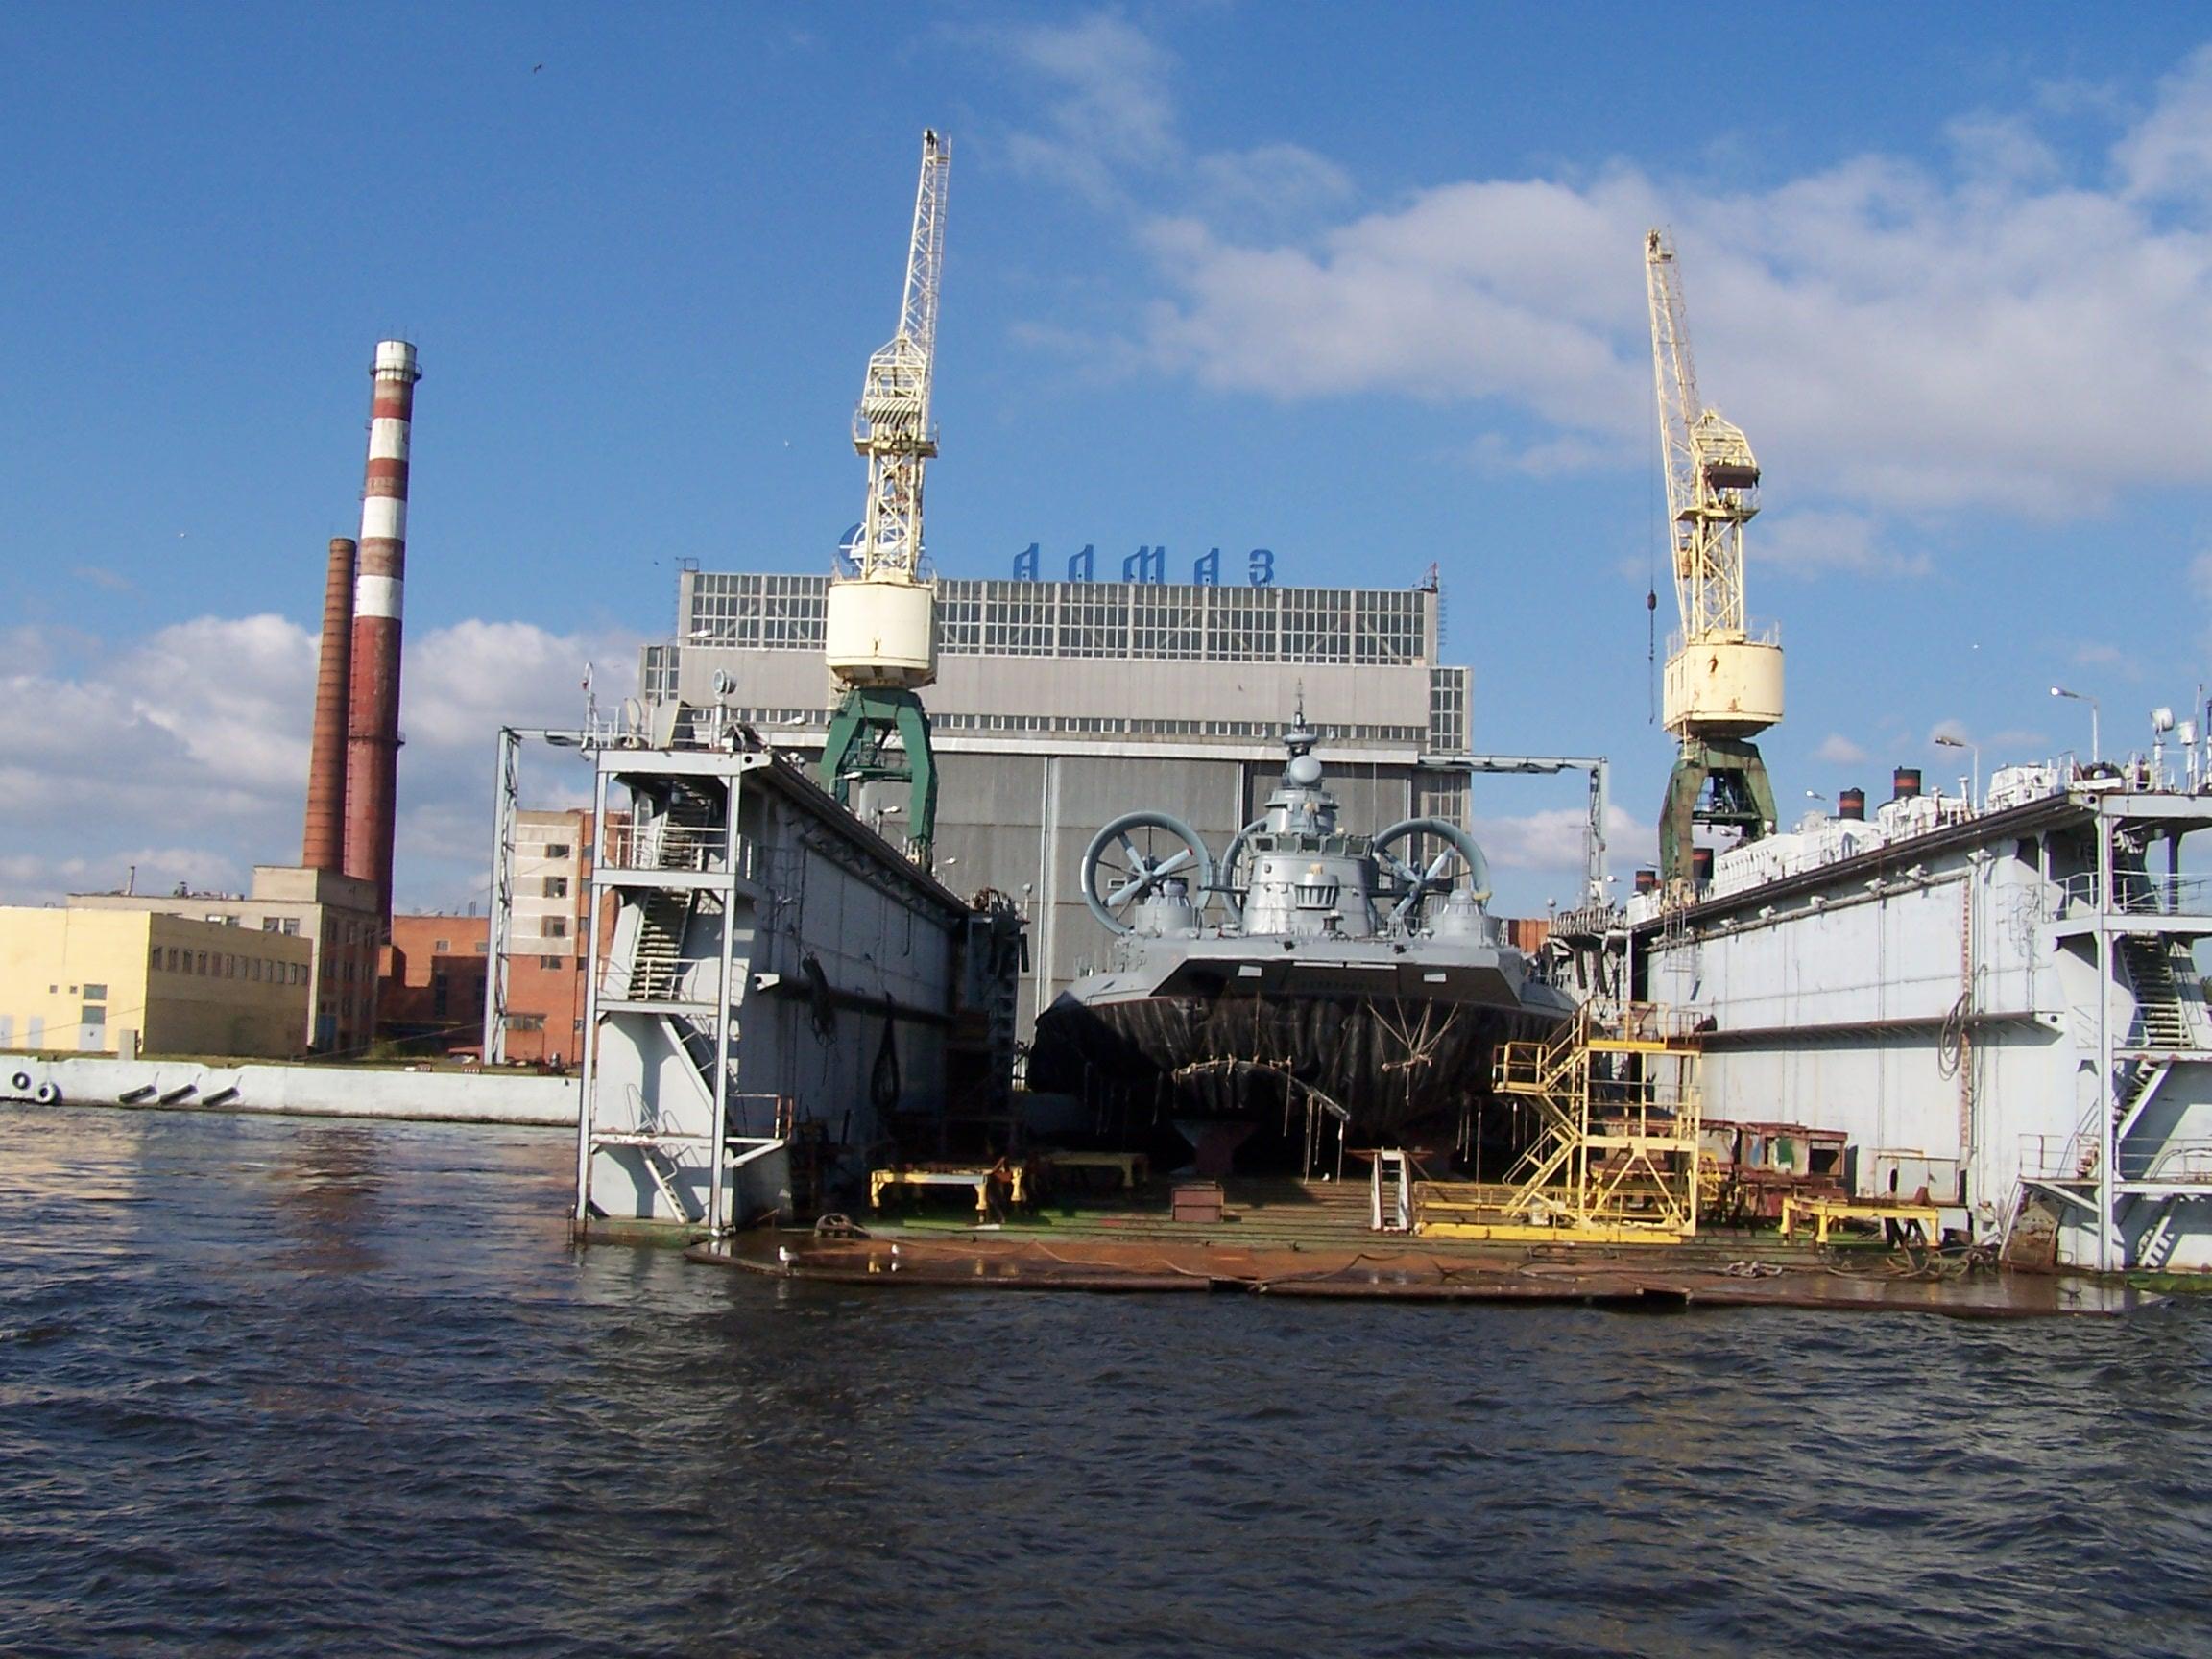 Cnc Plywood Boat Plans Januari 2018 1996 Lowe Wiring Diagram Filepomornik Class Ship In Floating Dock Wikimedia